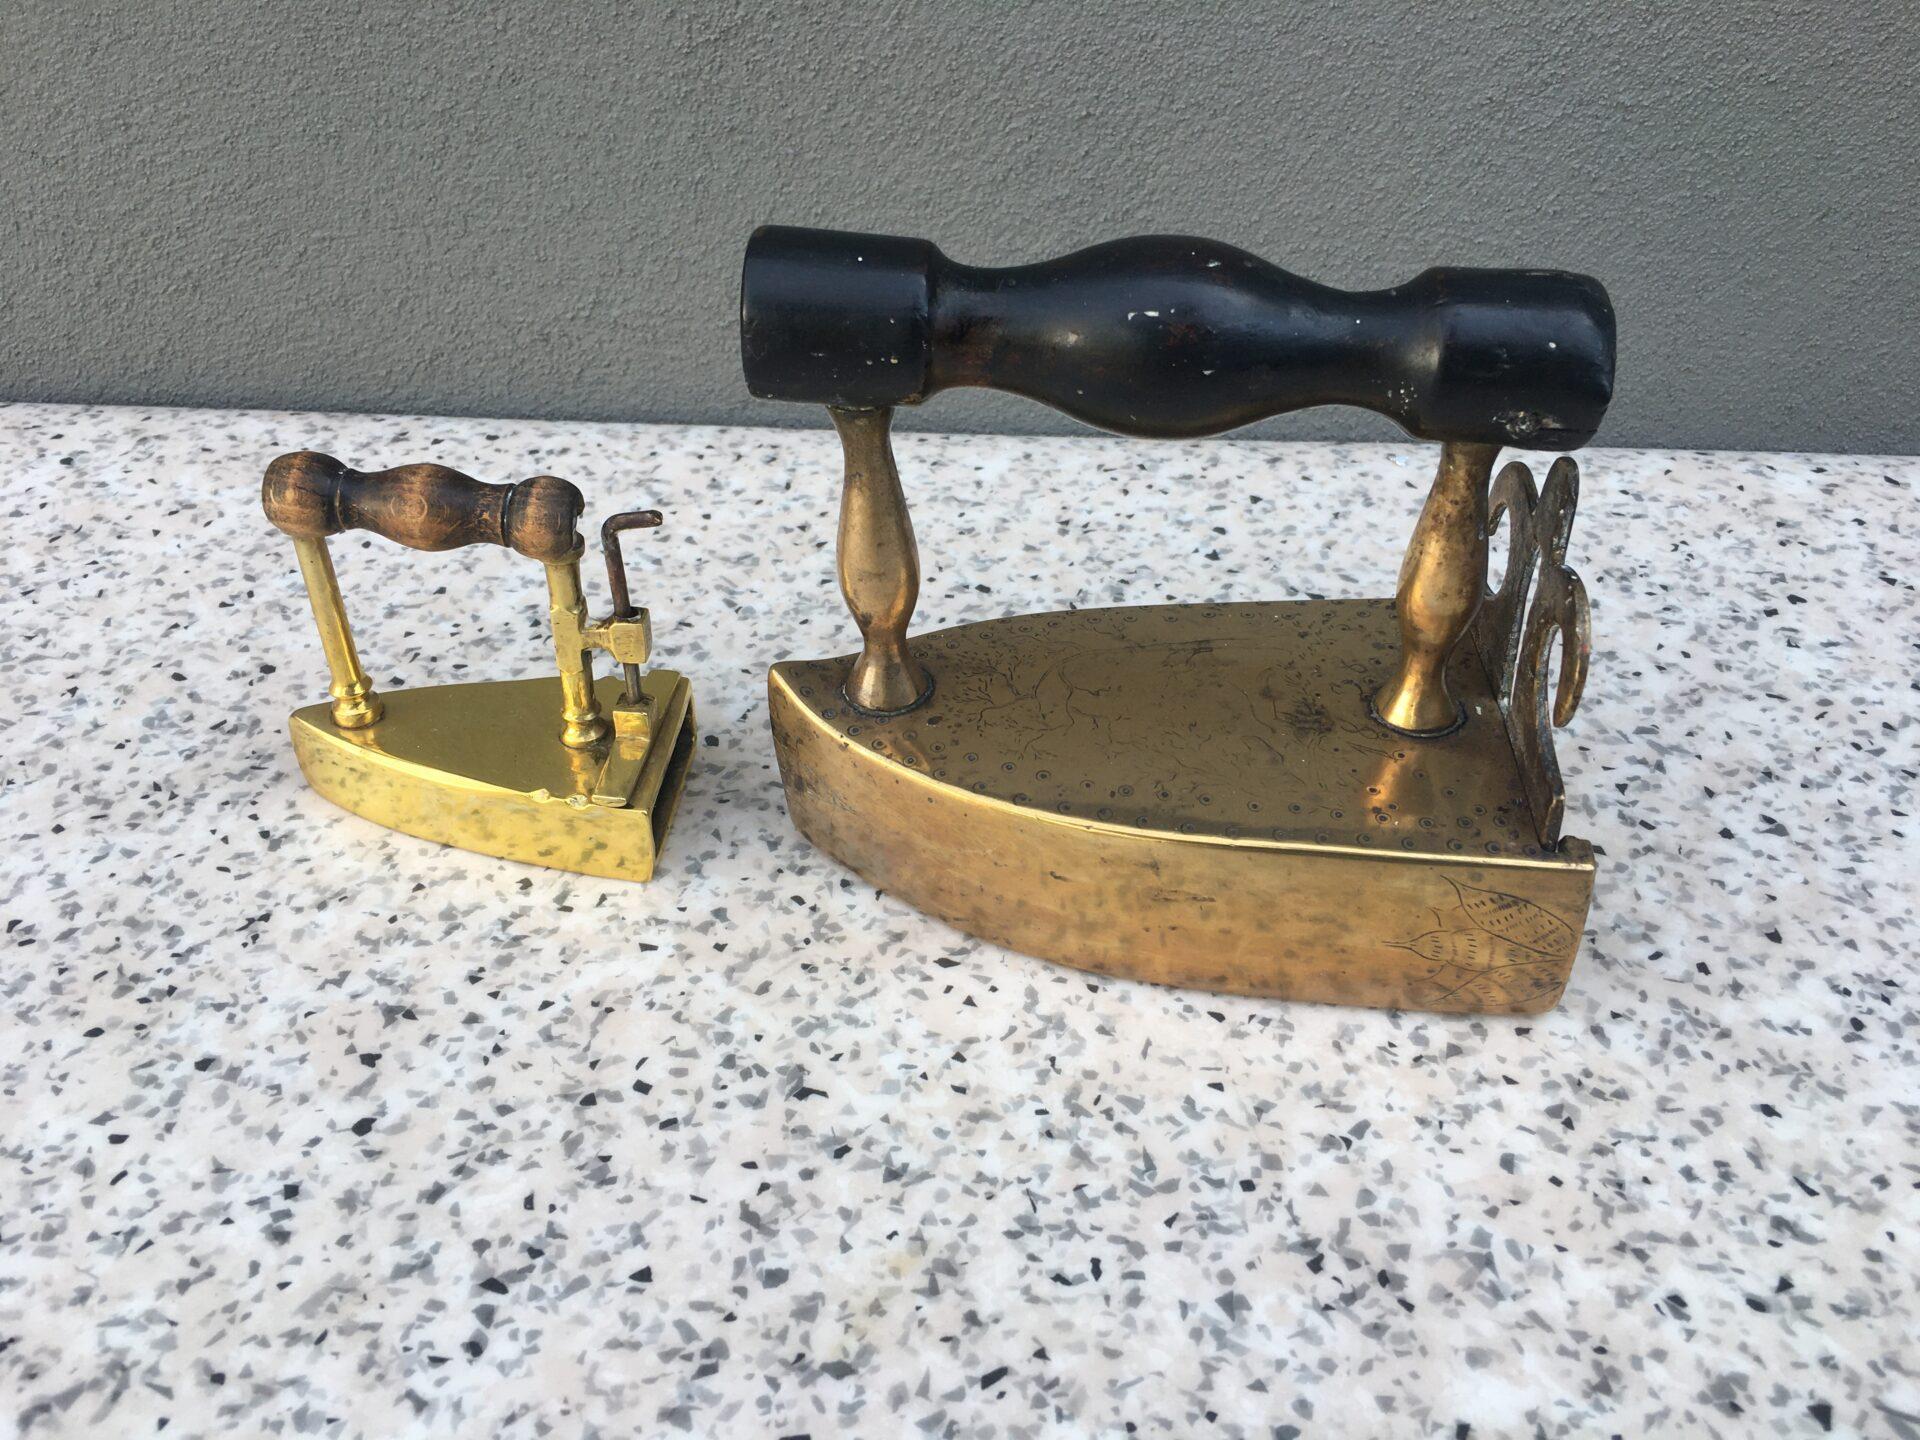 Antikke strygejern pr stk200/300 kr